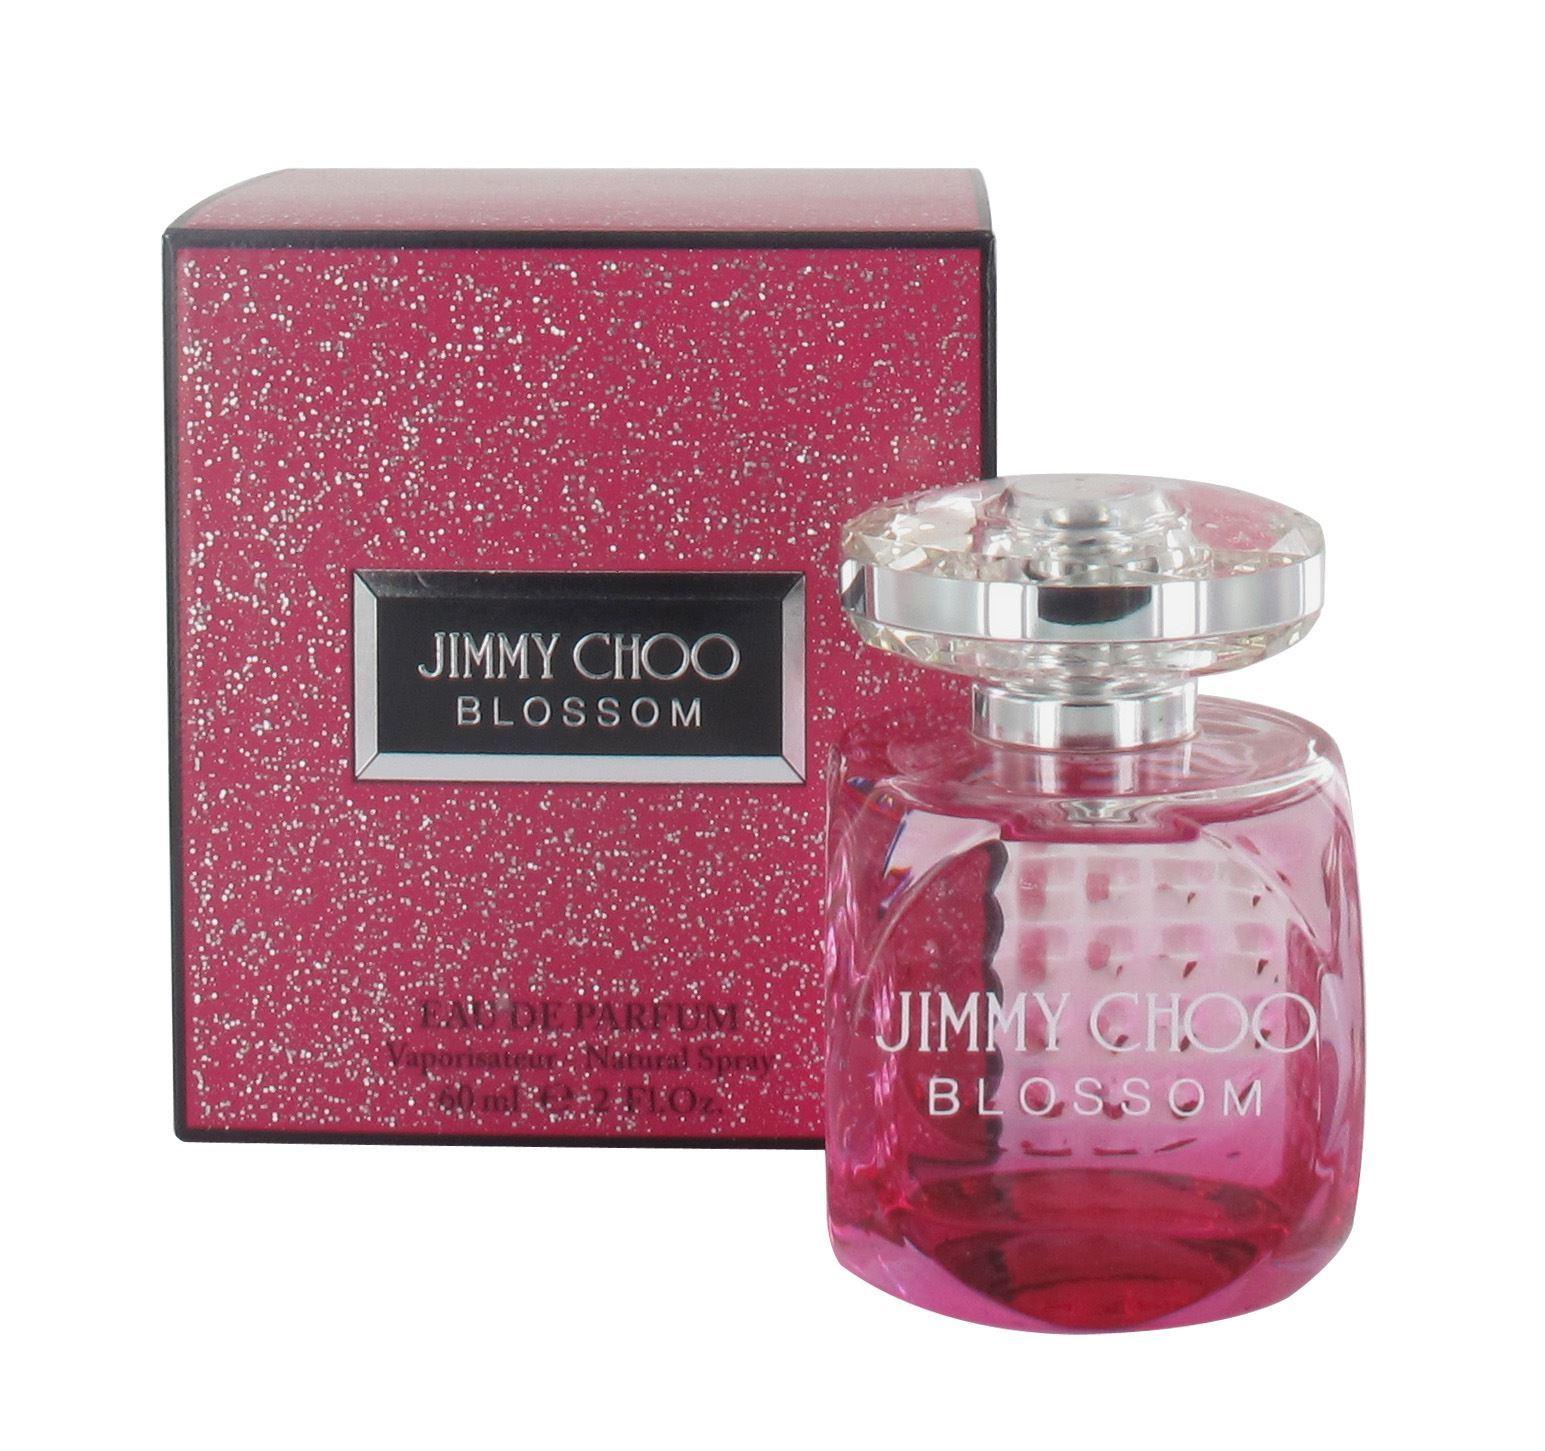 Jimmy Choo Blossom 60ml Eau de Parfum